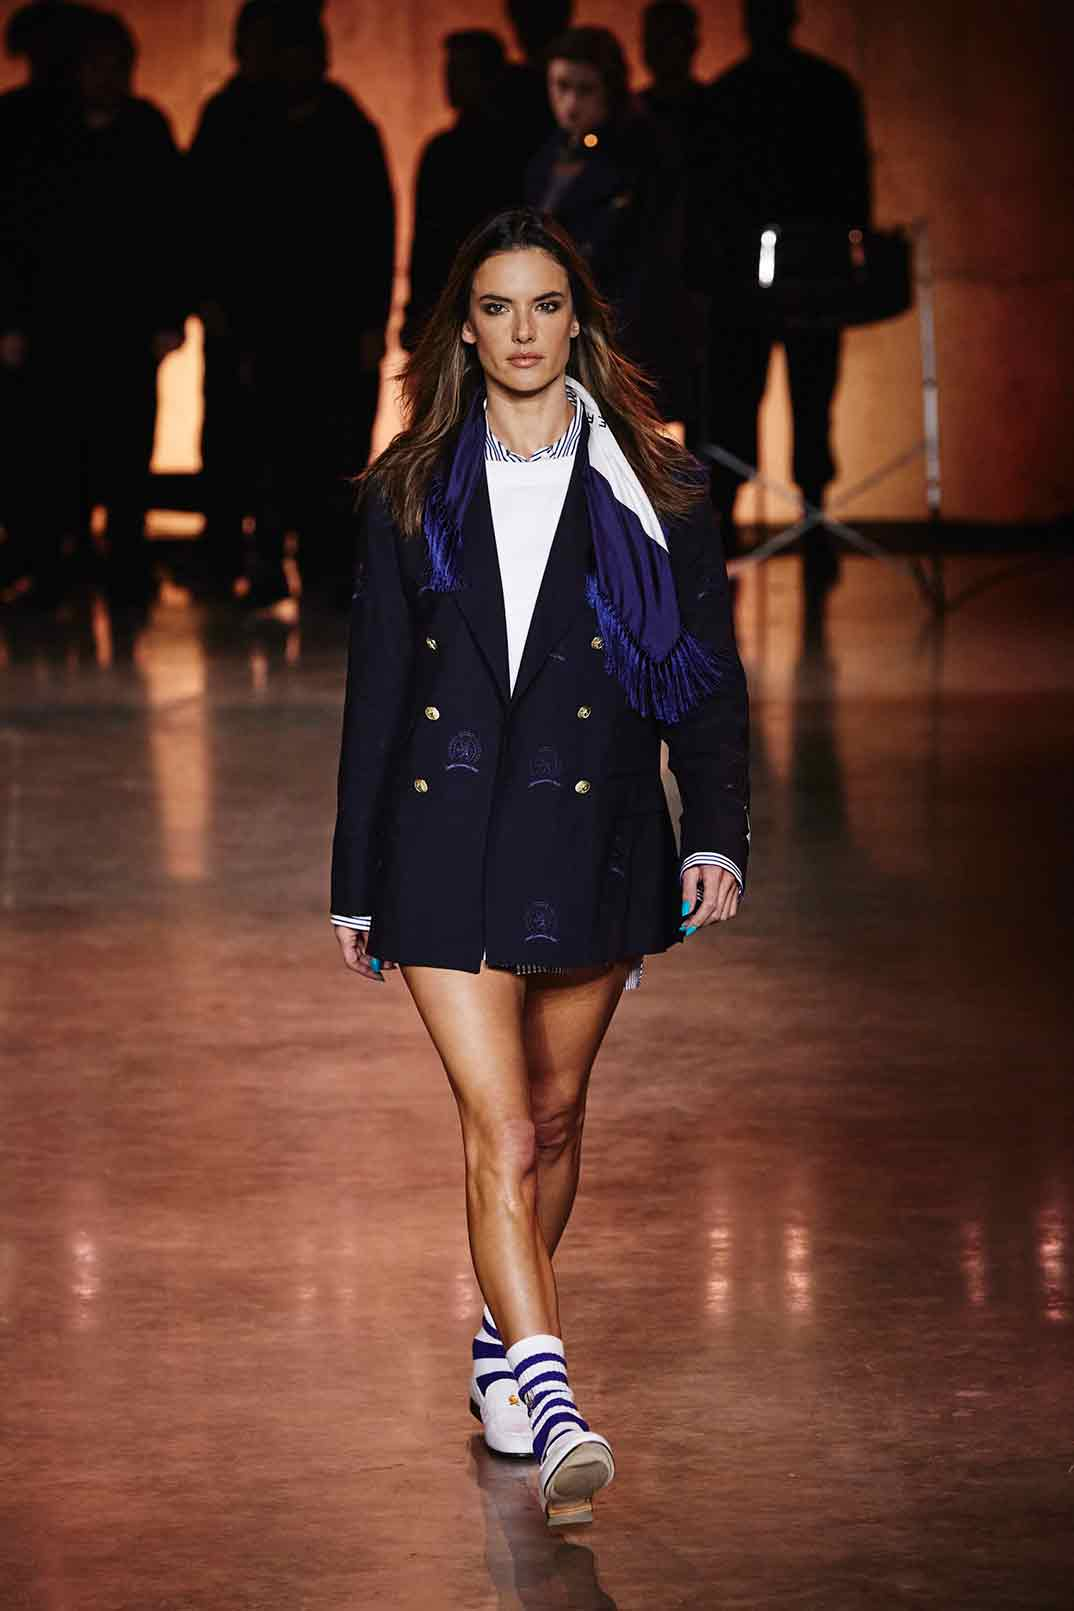 Alessandra Ambrosio - TommyXLewis - Londres Fashion Week